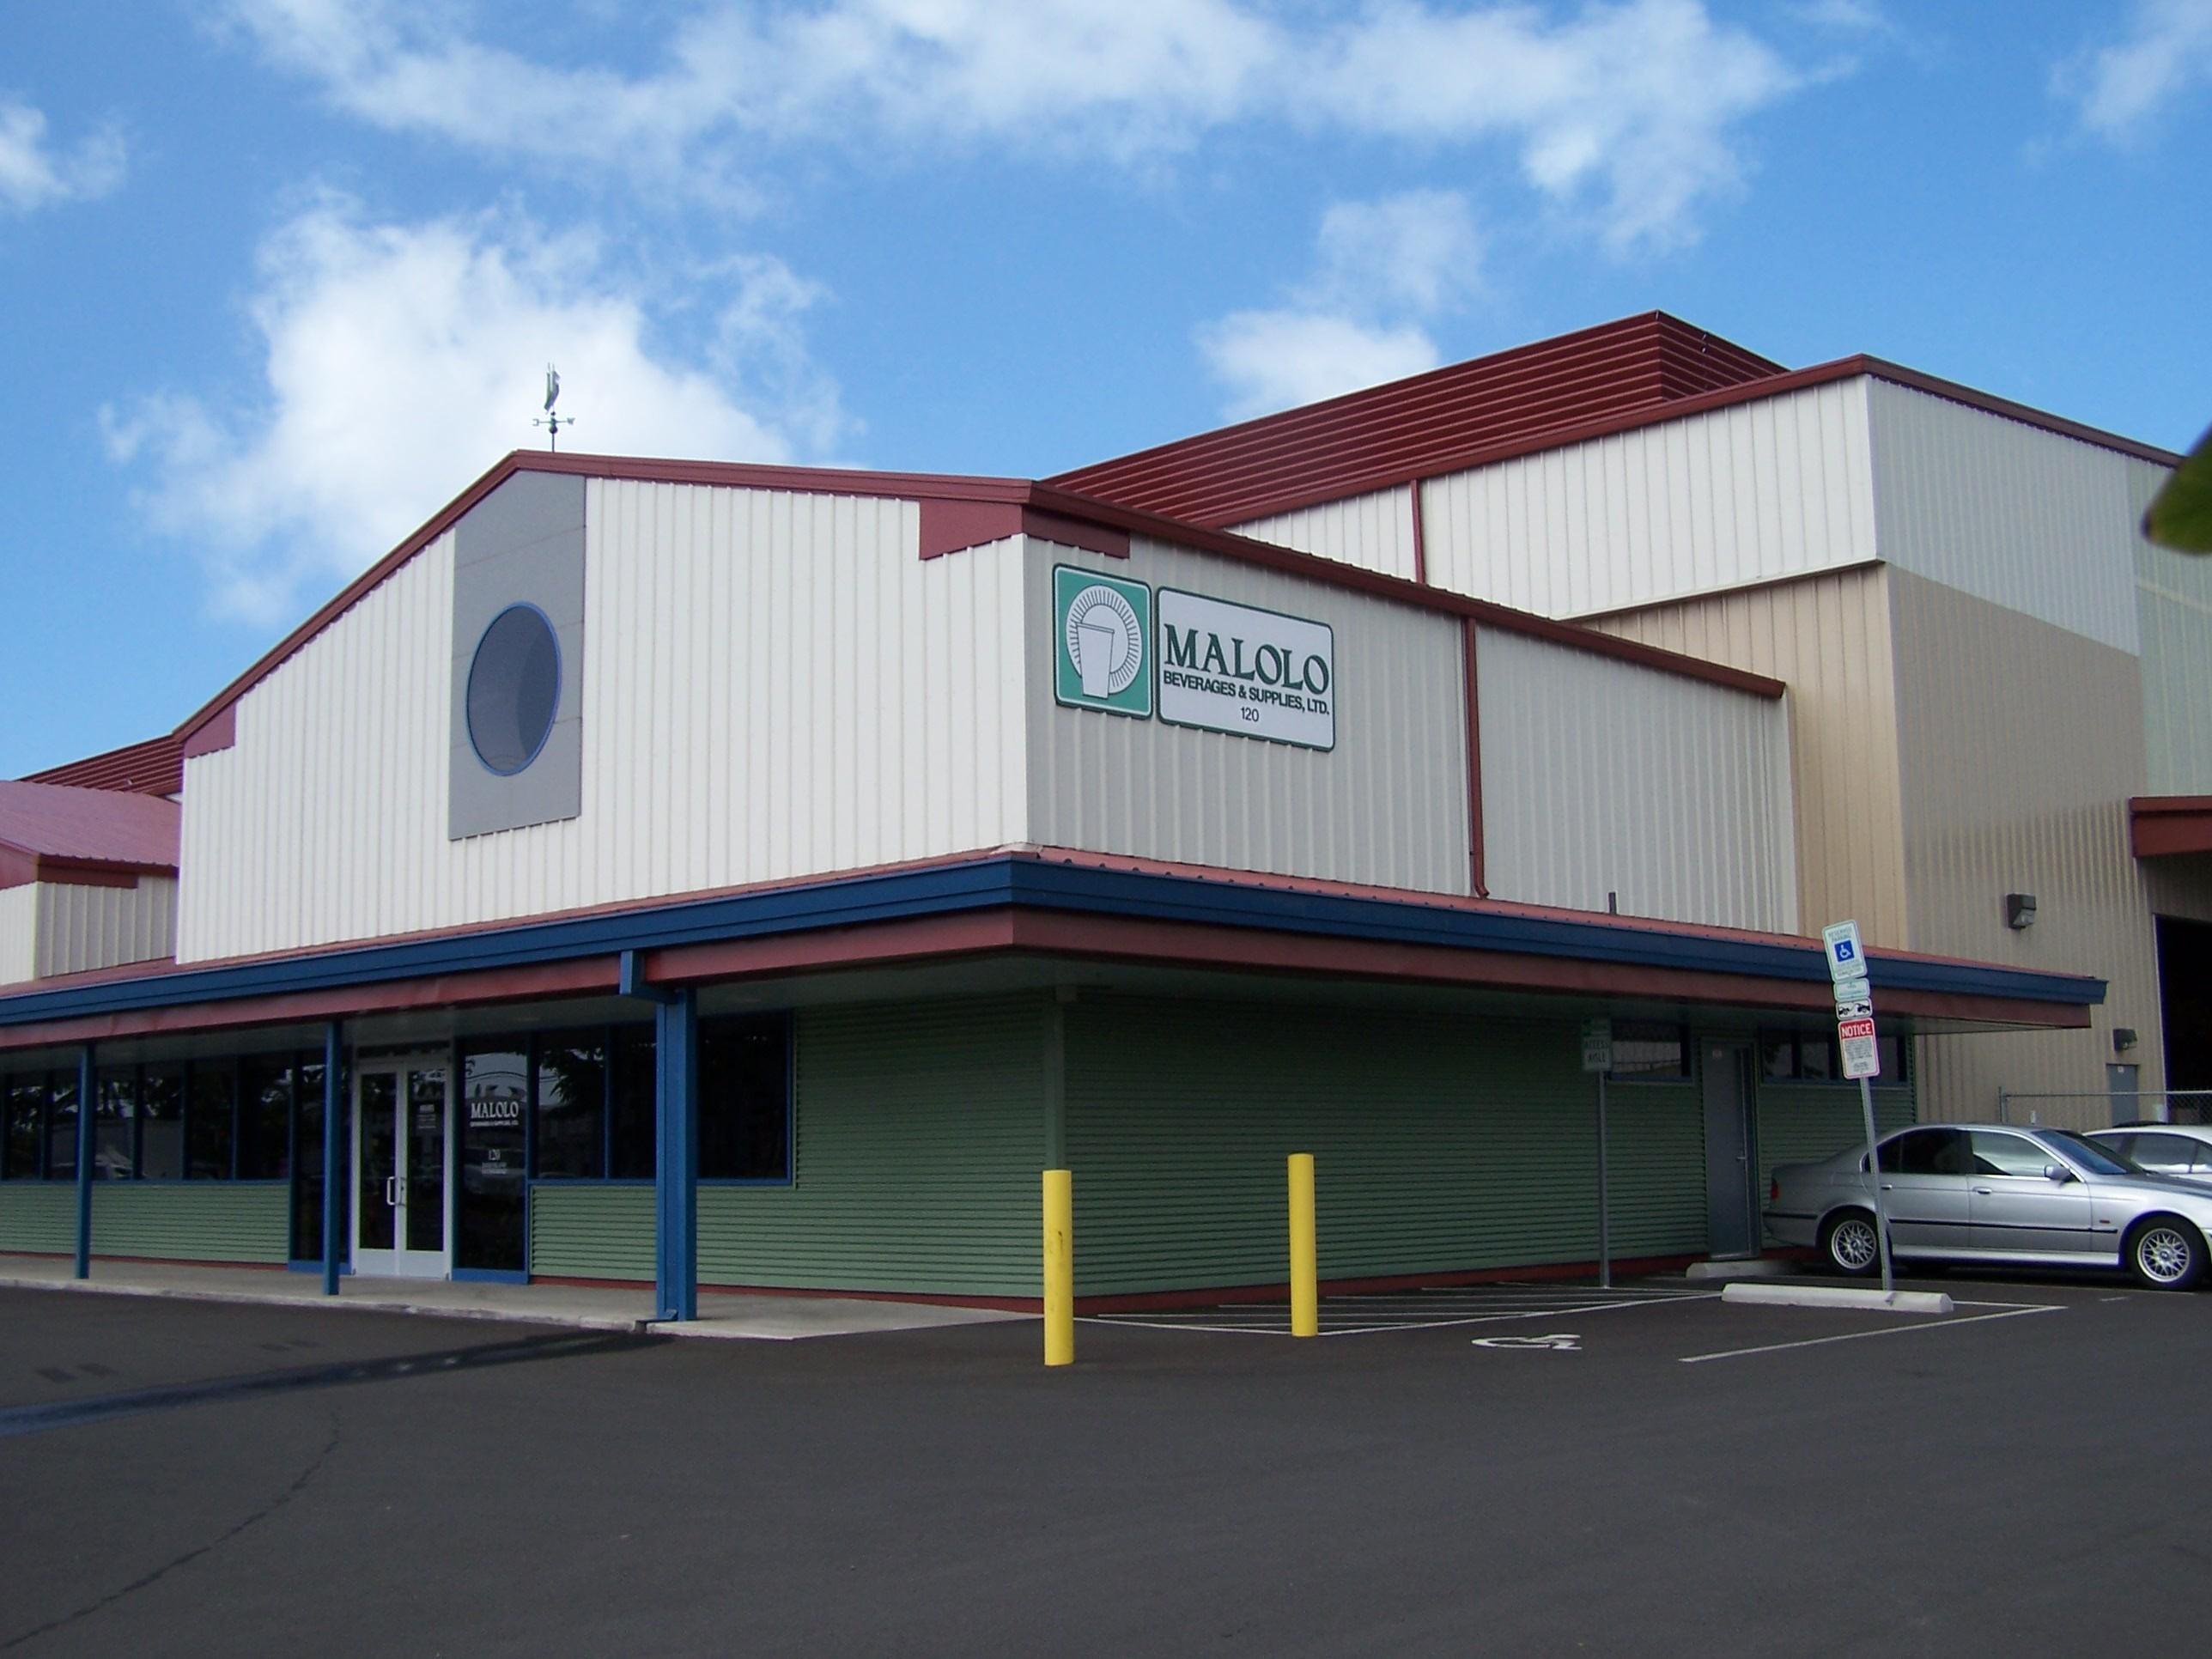 Distribution center for Malolo Beverages in Honolulu, HI